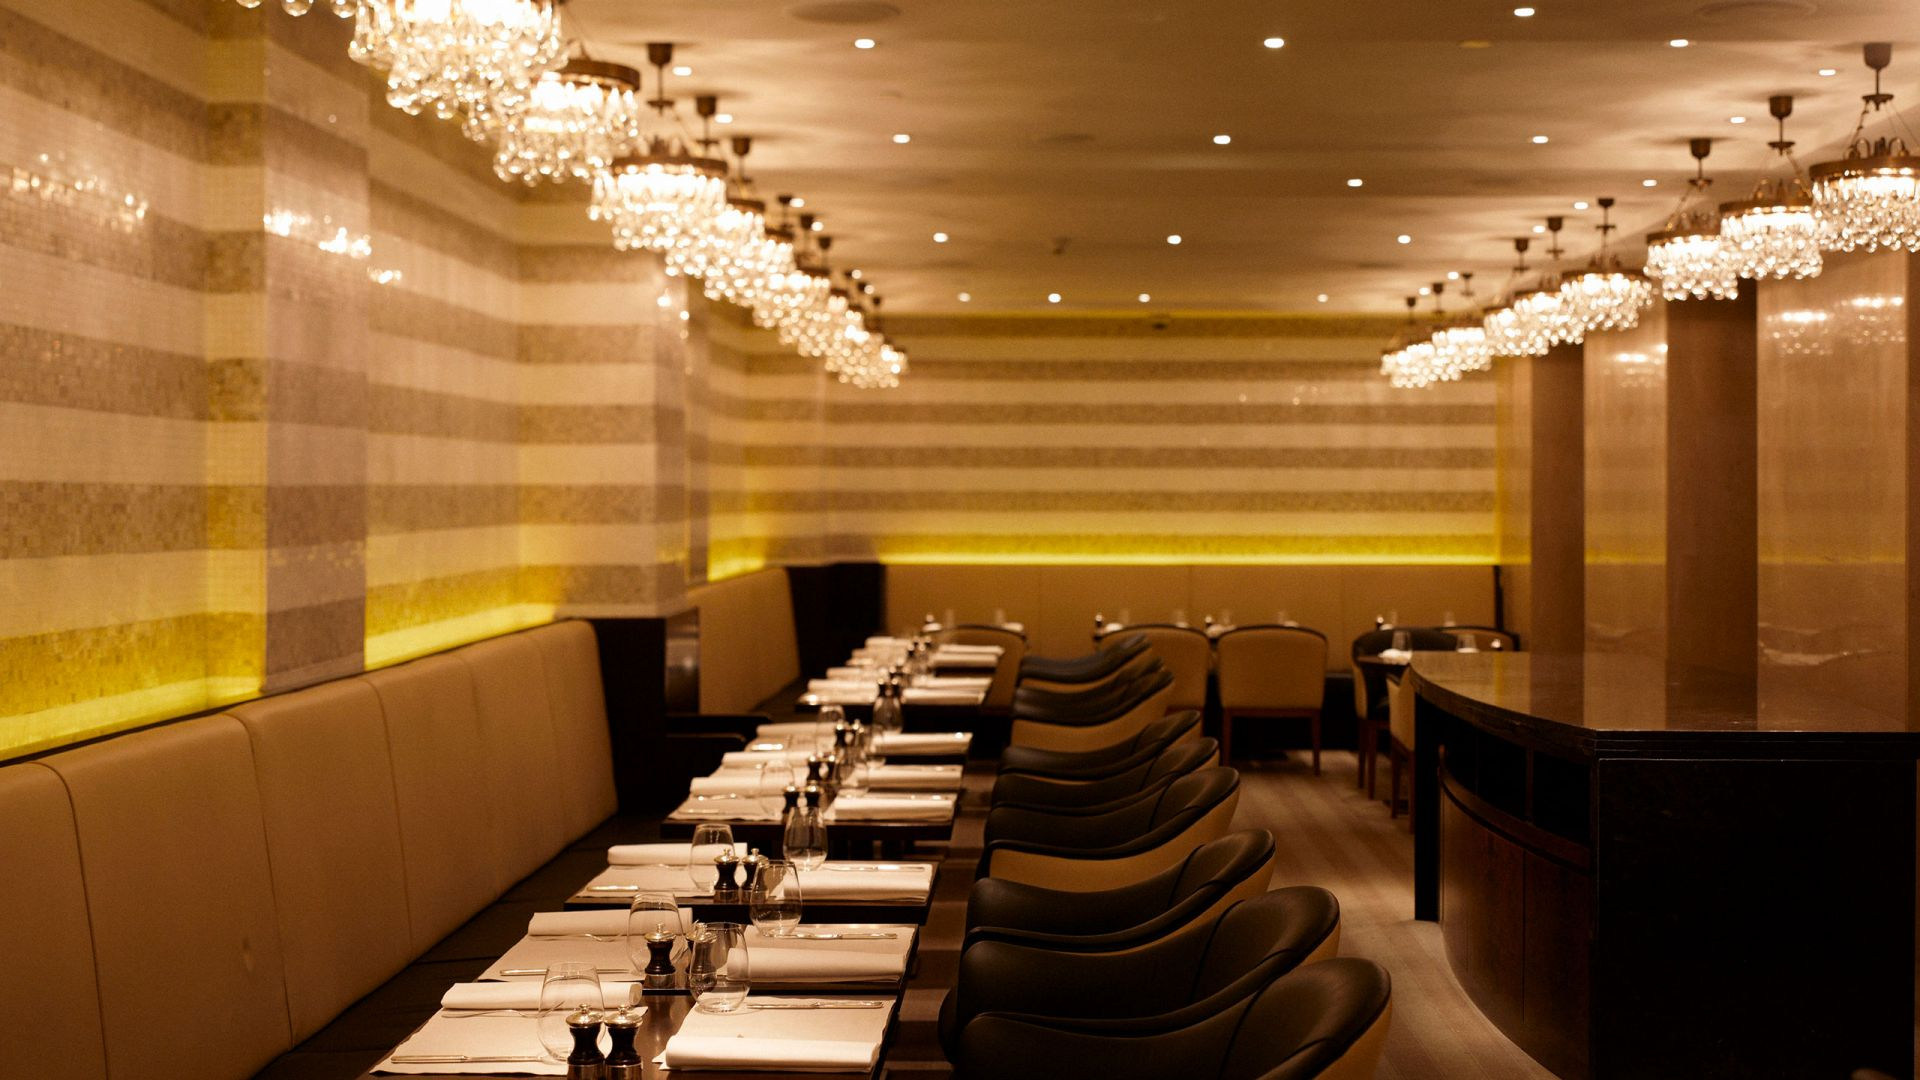 Restaurants and Bars in Nişantaşı